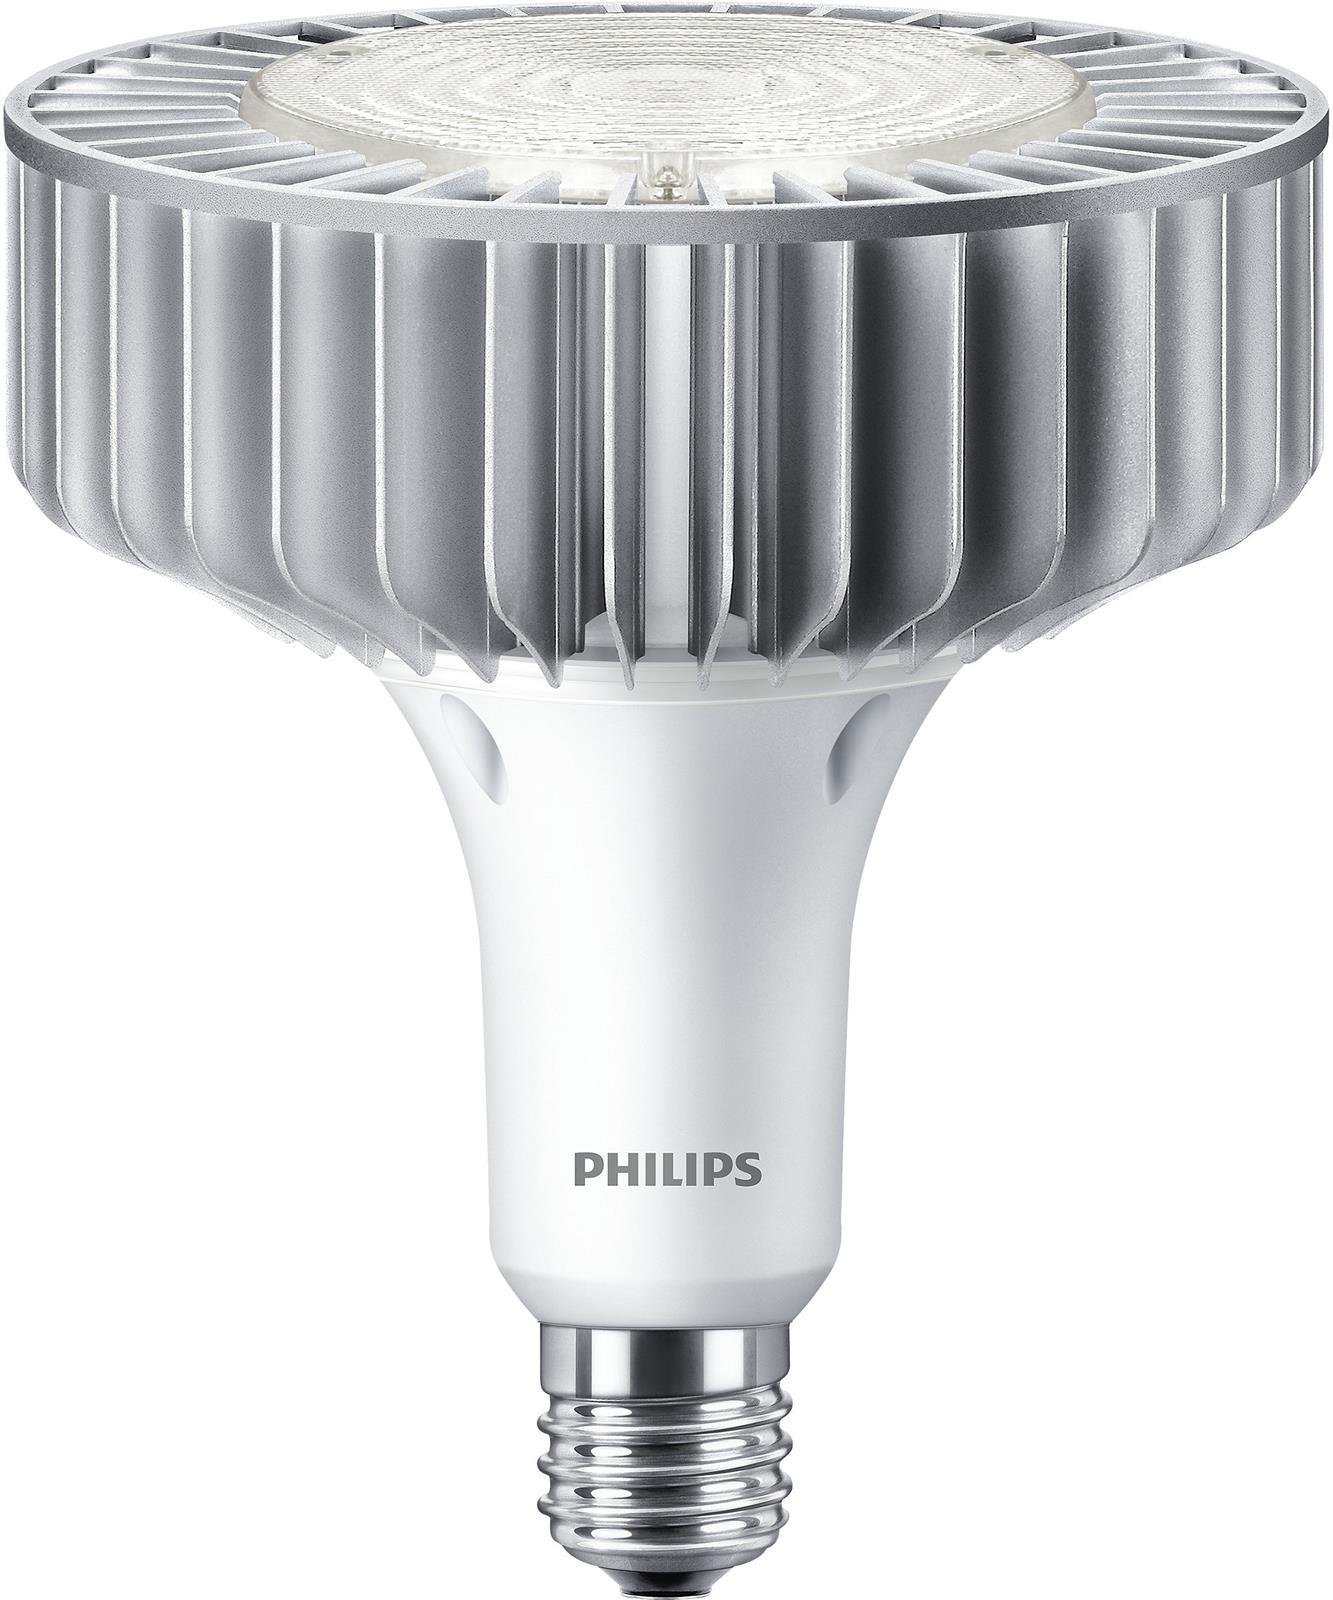 LED HIGH-BAY 145W E40 840 60